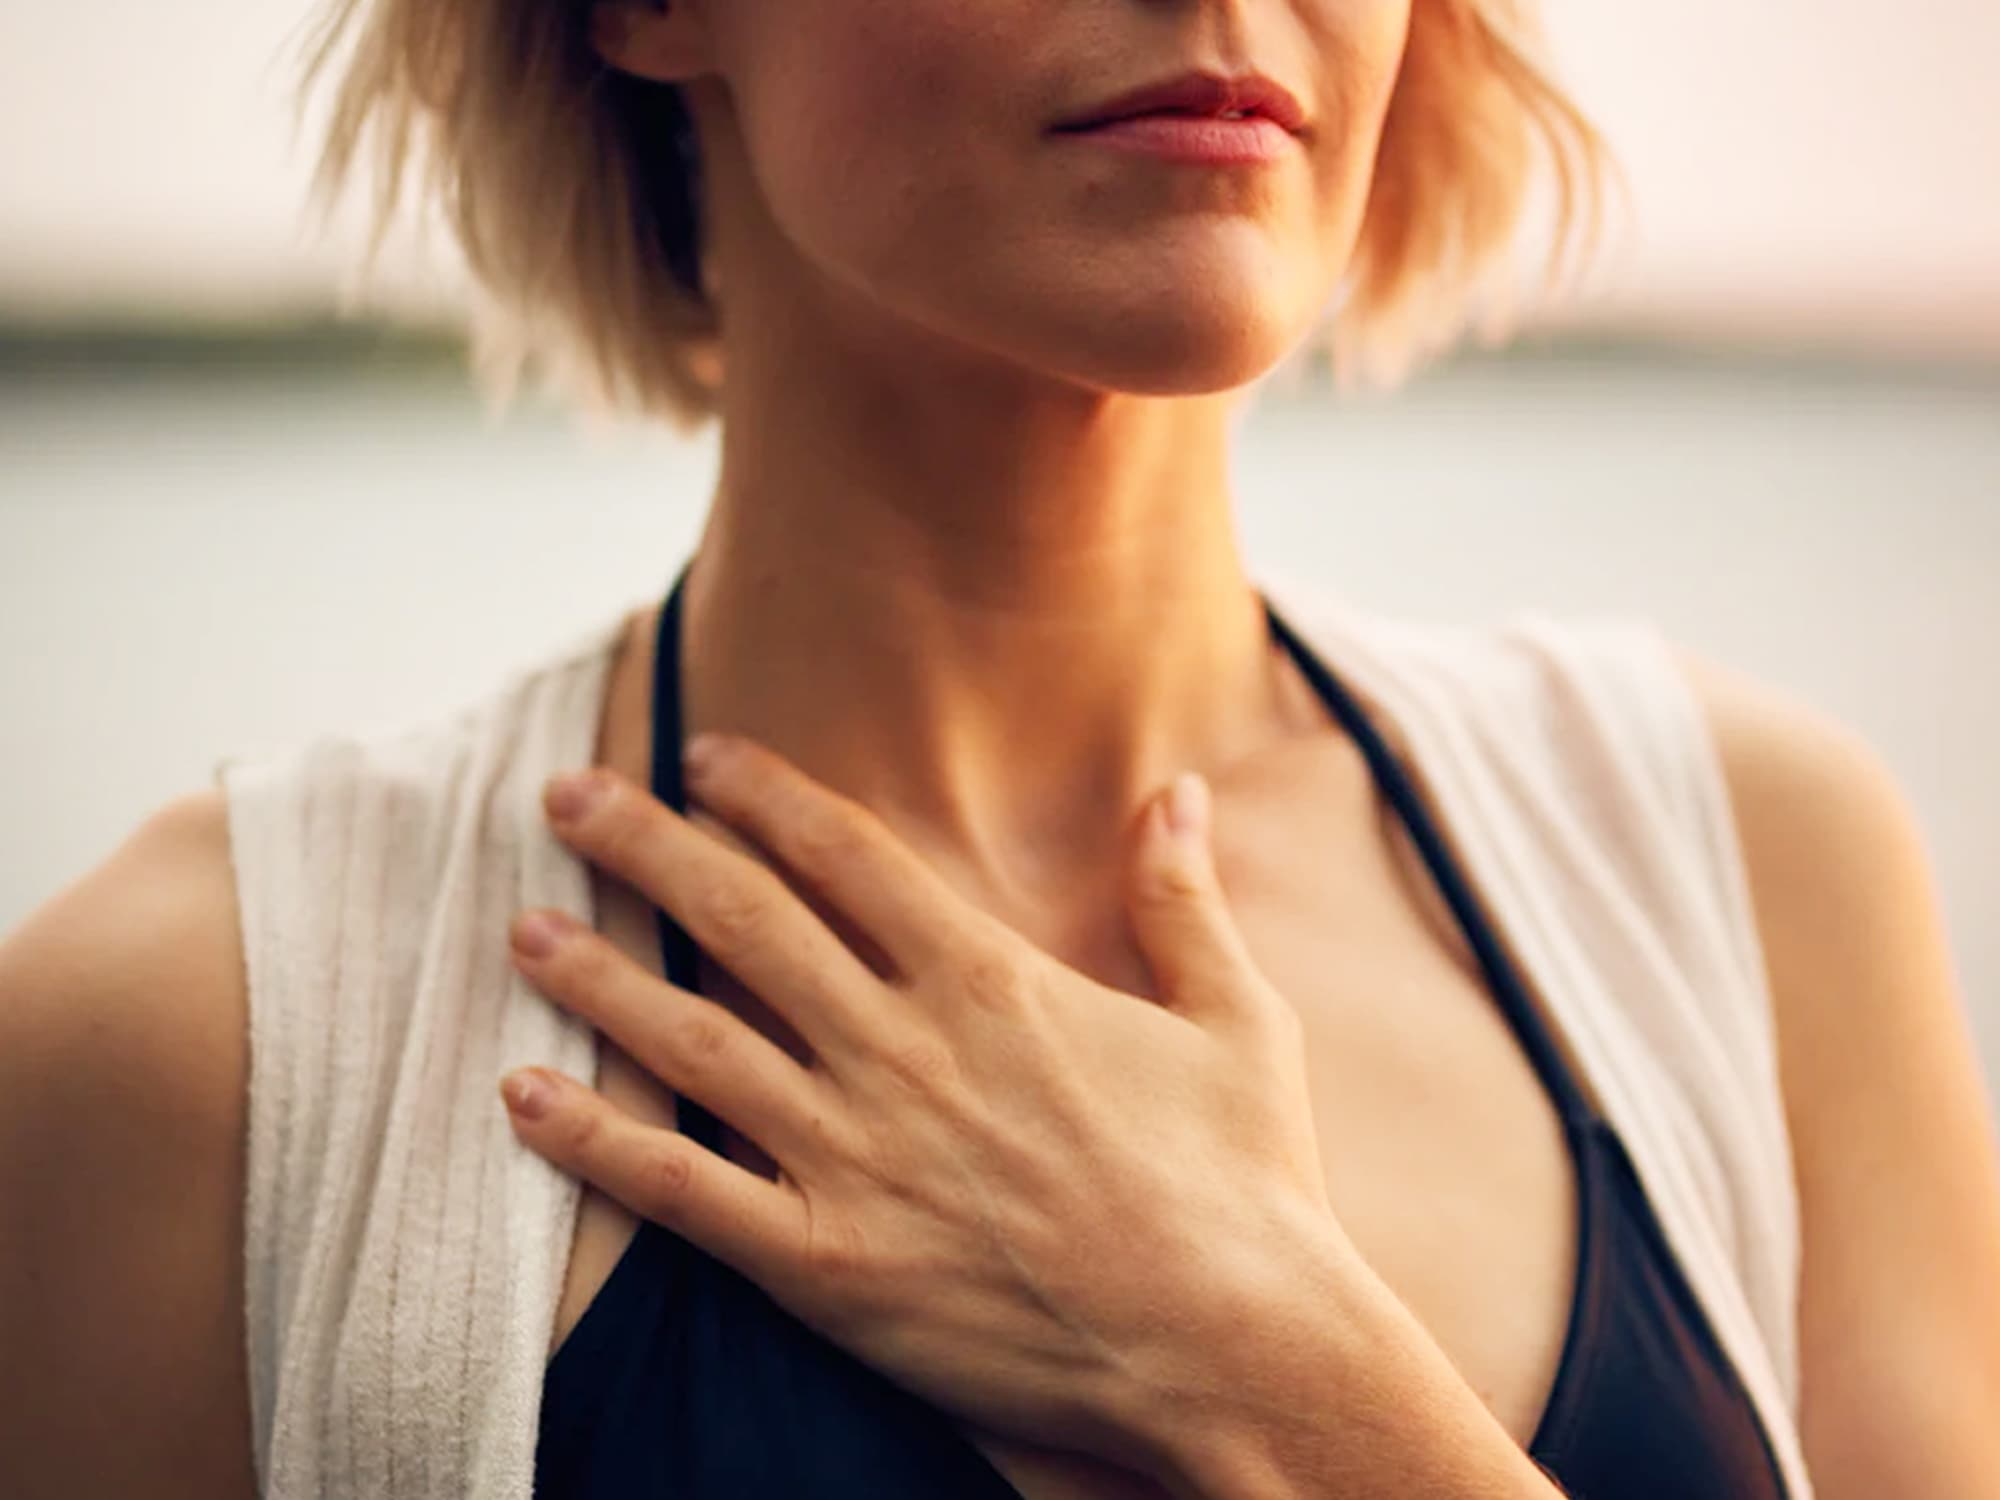 Natalie Day Fertility Yoga in Billericay